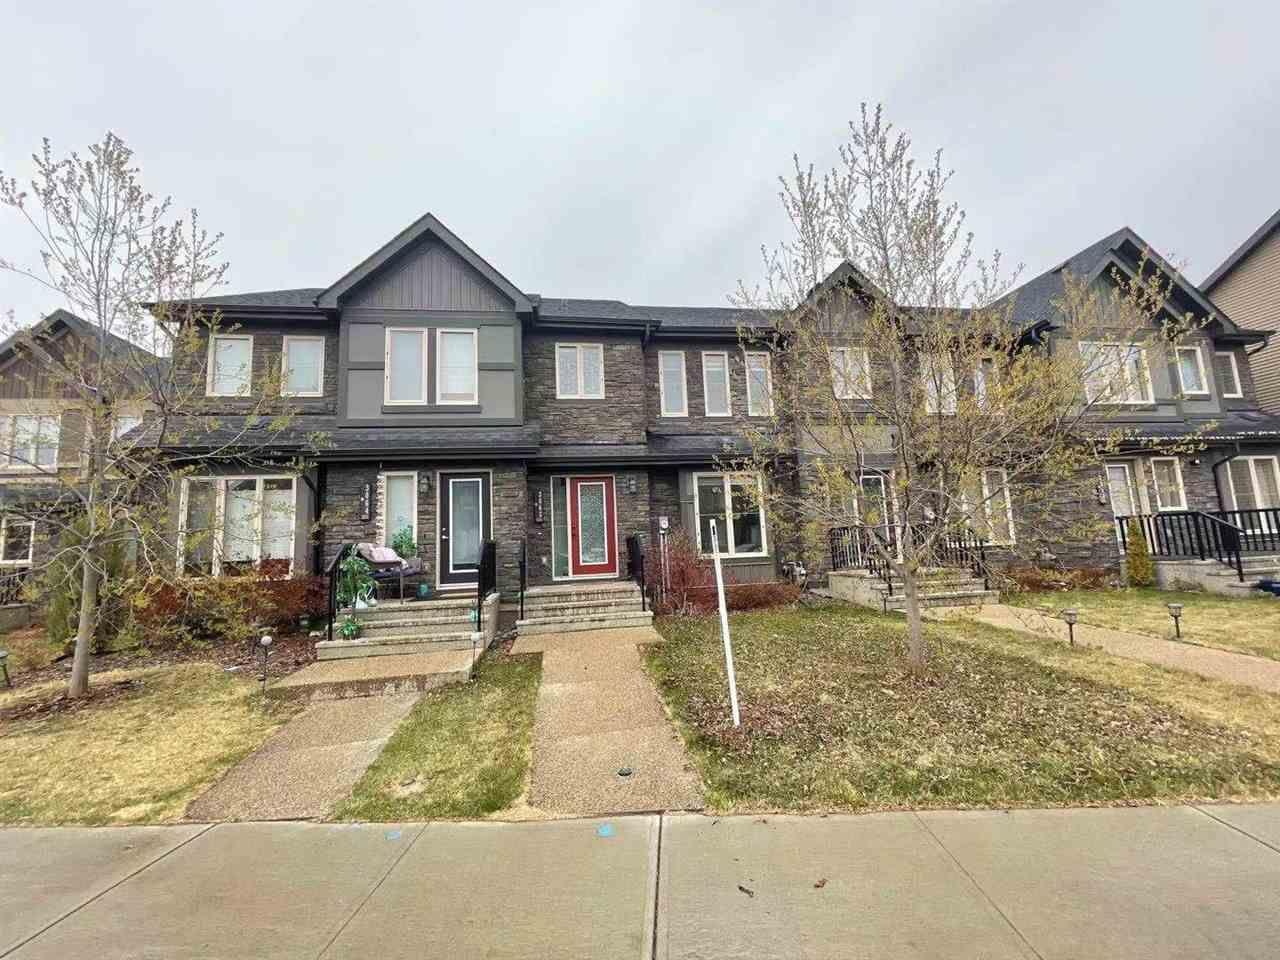 Main Photo: 3062 KESWICK Way in Edmonton: Zone 56 Attached Home for sale : MLS®# E4241922